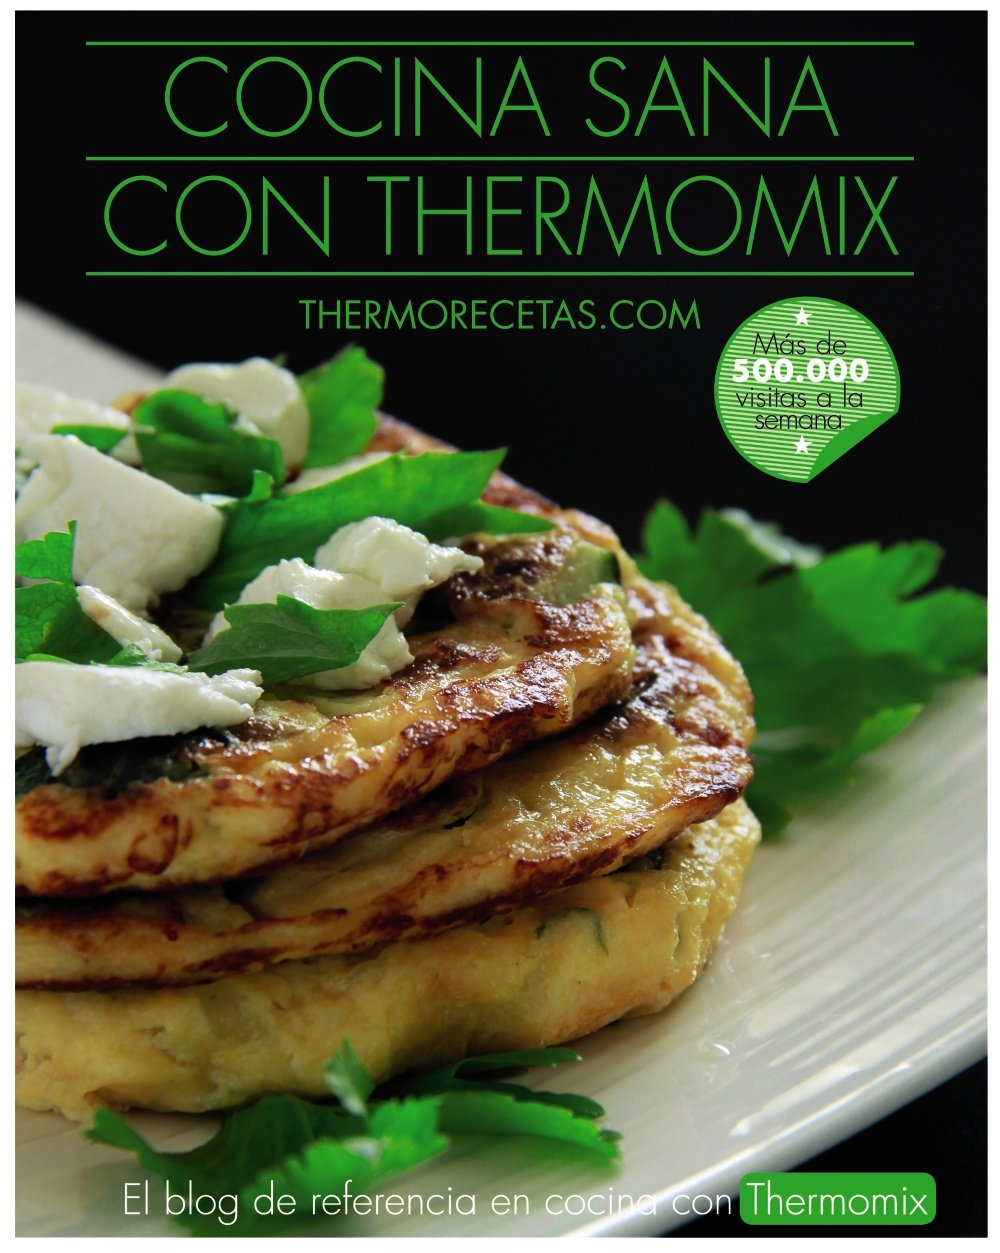 Cocina sana con Thermomix (Libros Singulares): Amazon.es ...